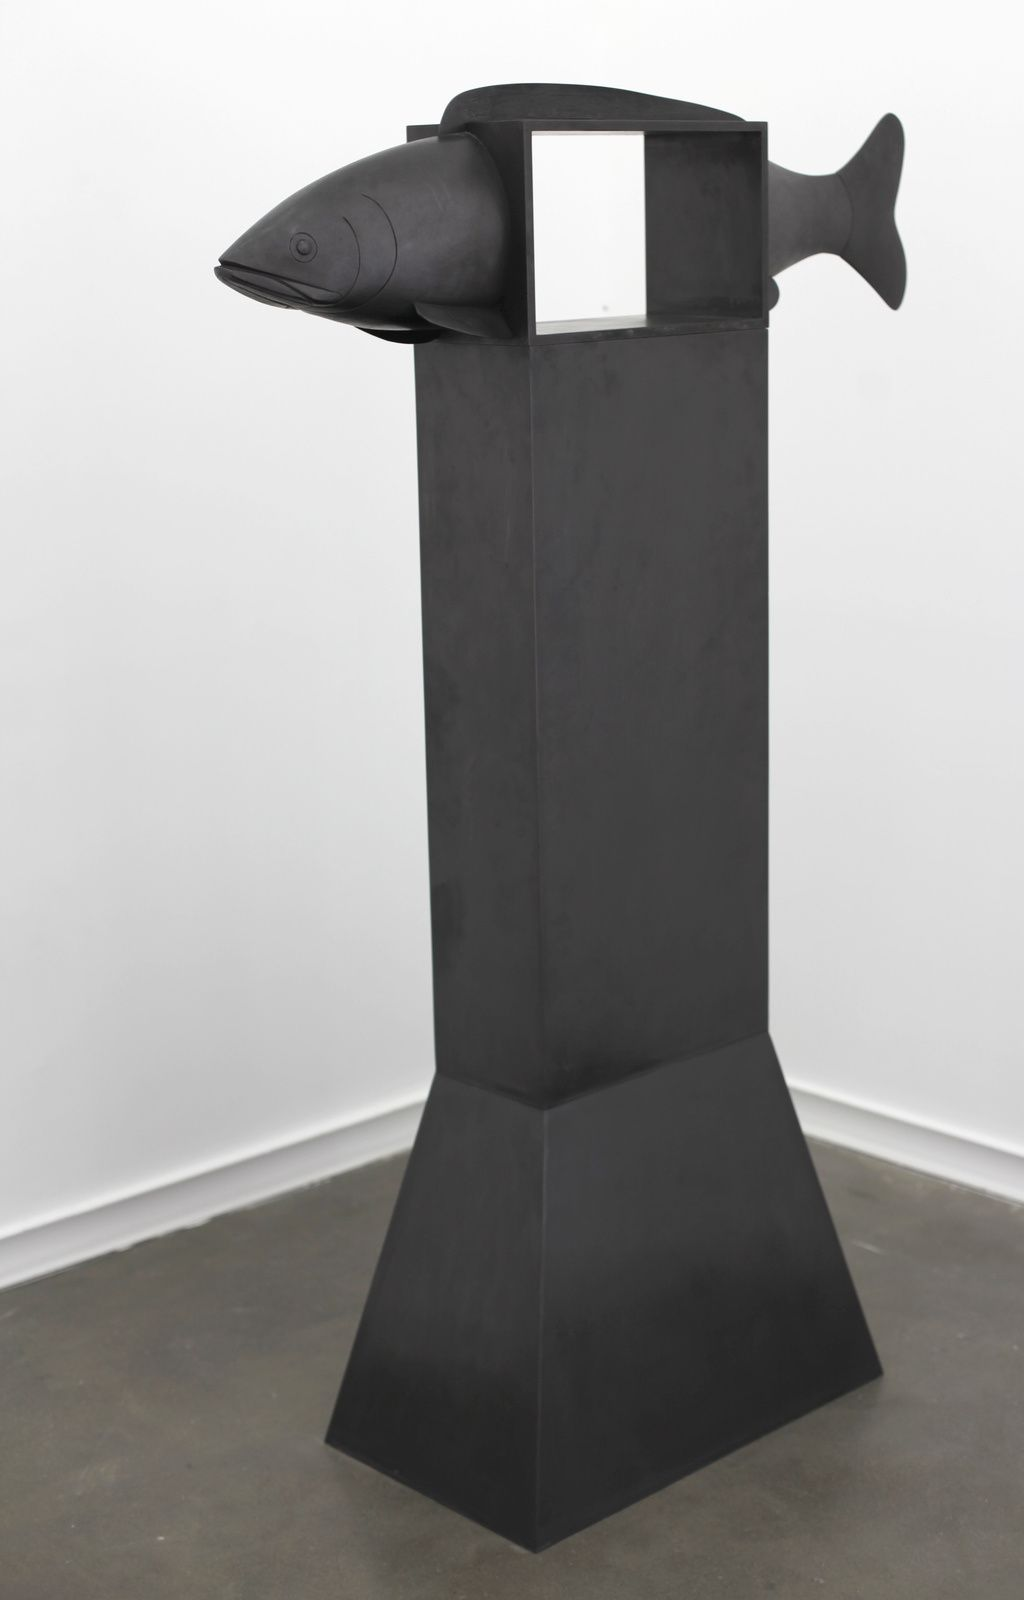 """Poisson paysage IV"", 2007 de Françoic Xavier LALANNE - Courtesy Galerie Mitterrand © Photo Éric Simon"